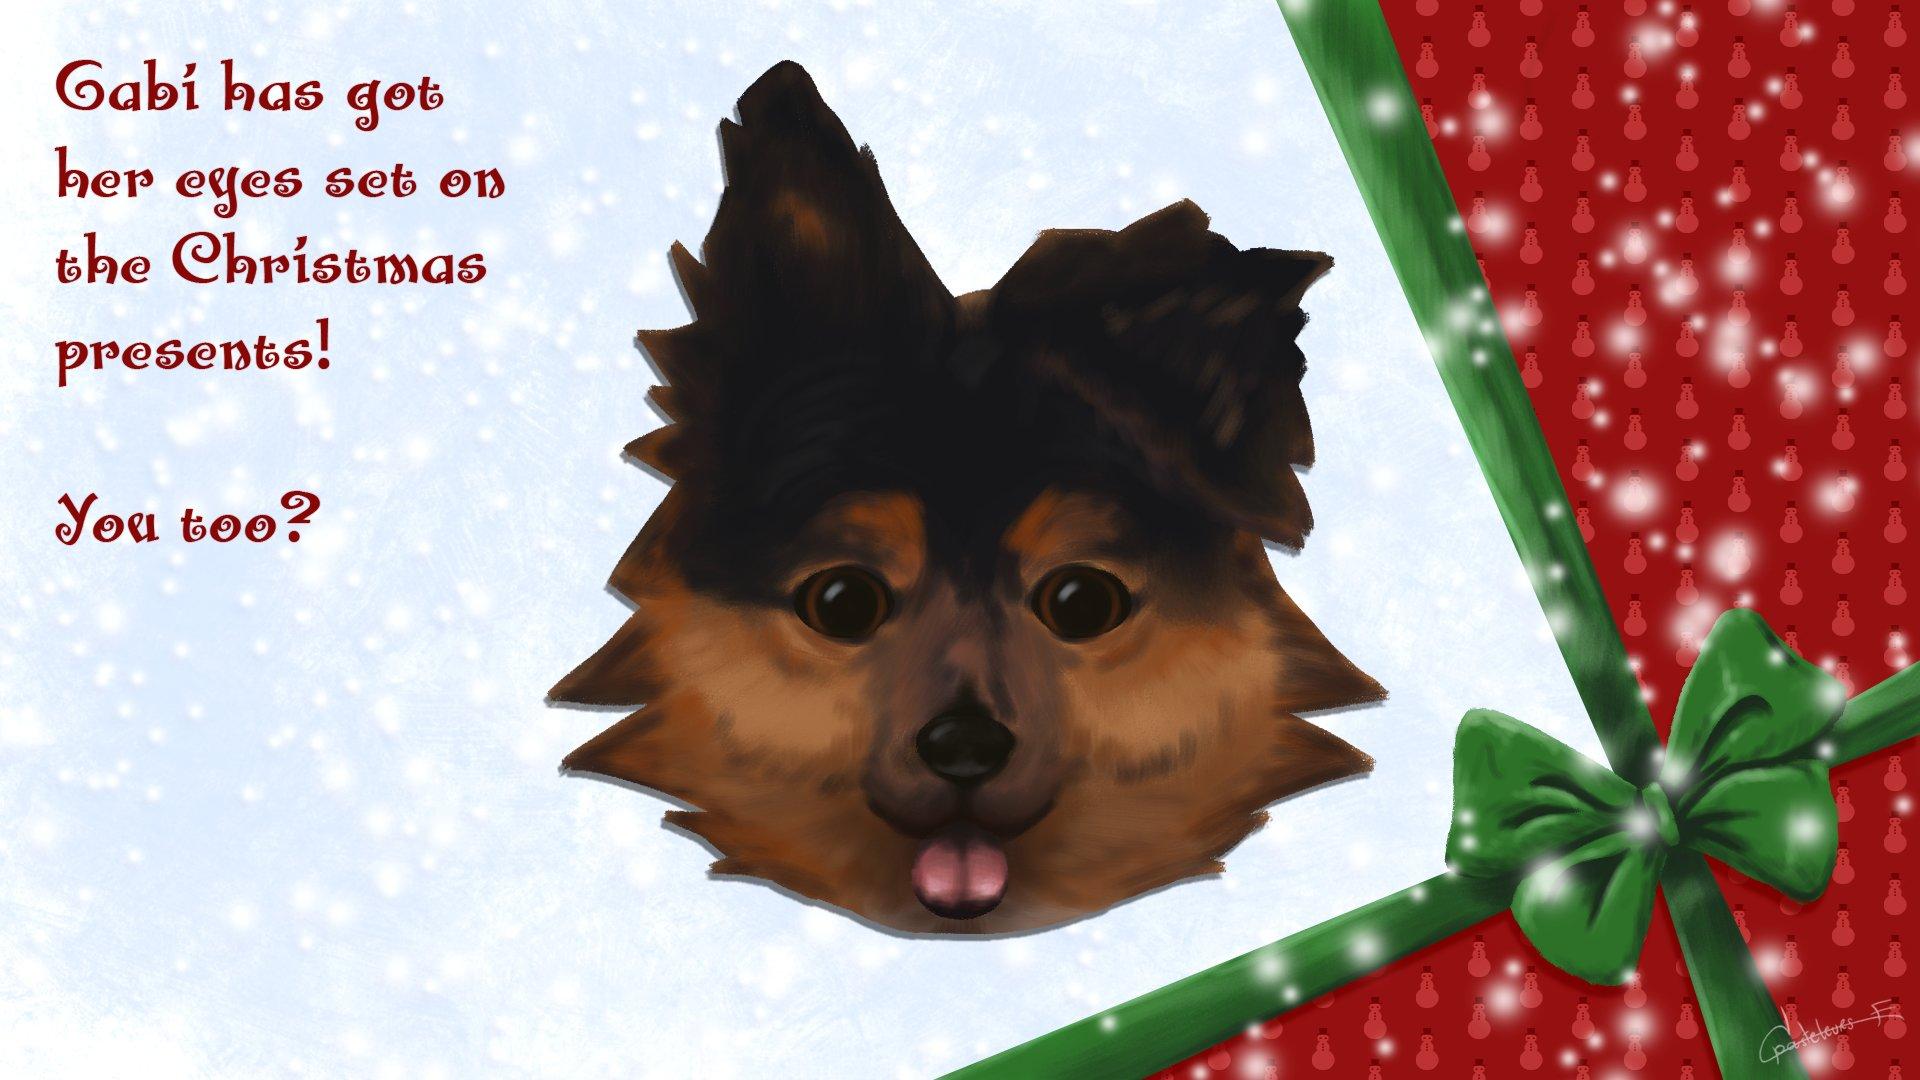 Fabyan pasteleurs christmascard 2014 gabi eng